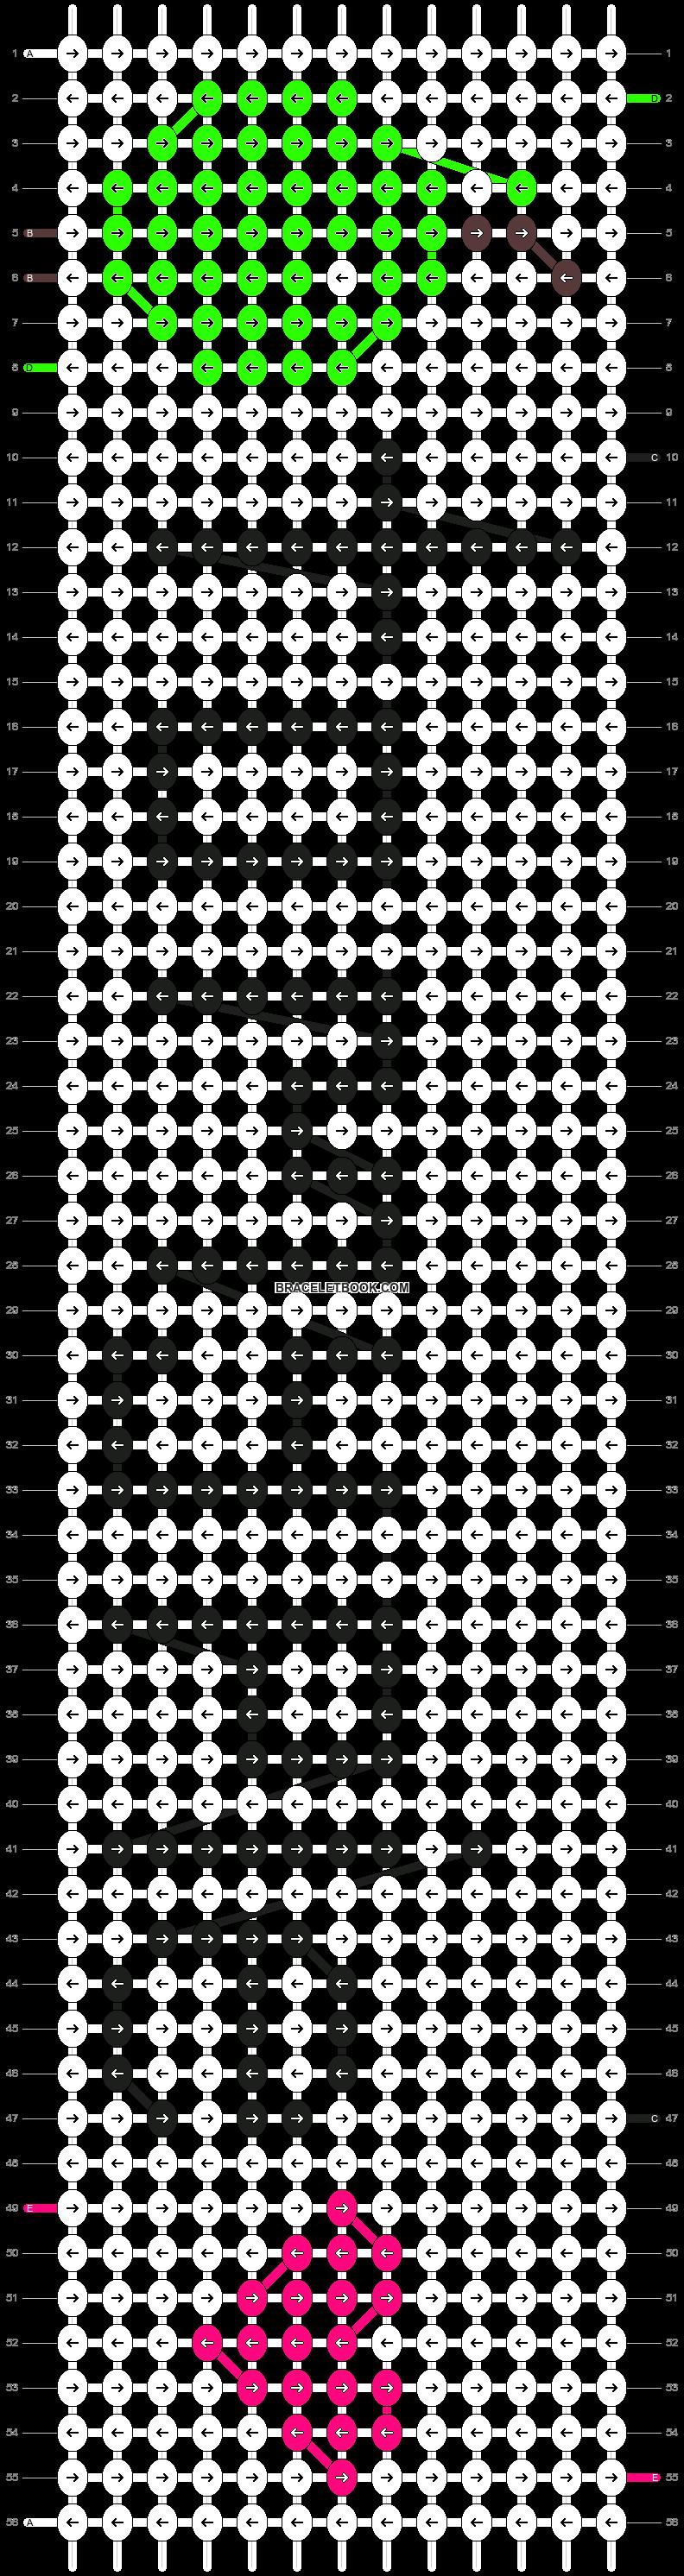 Alpha pattern #2437 pattern